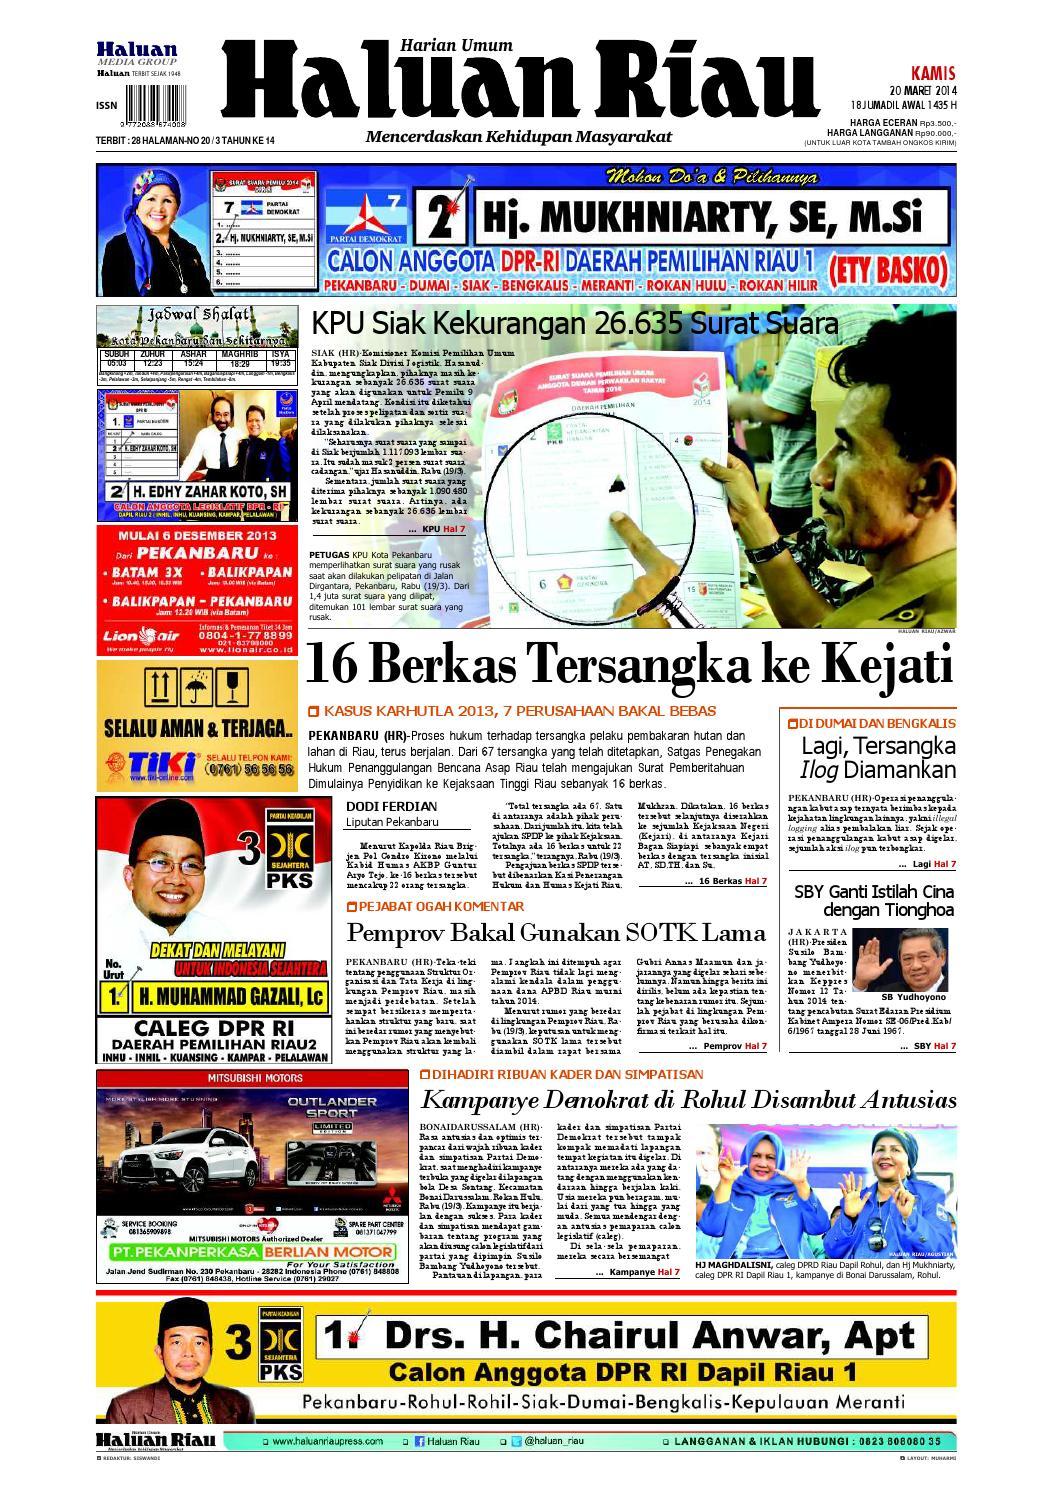 Haluanriau 2014 03 20 By Haluan Riau Issuu Produk Ukm Bumn Kue Sagu Ikan Haruan